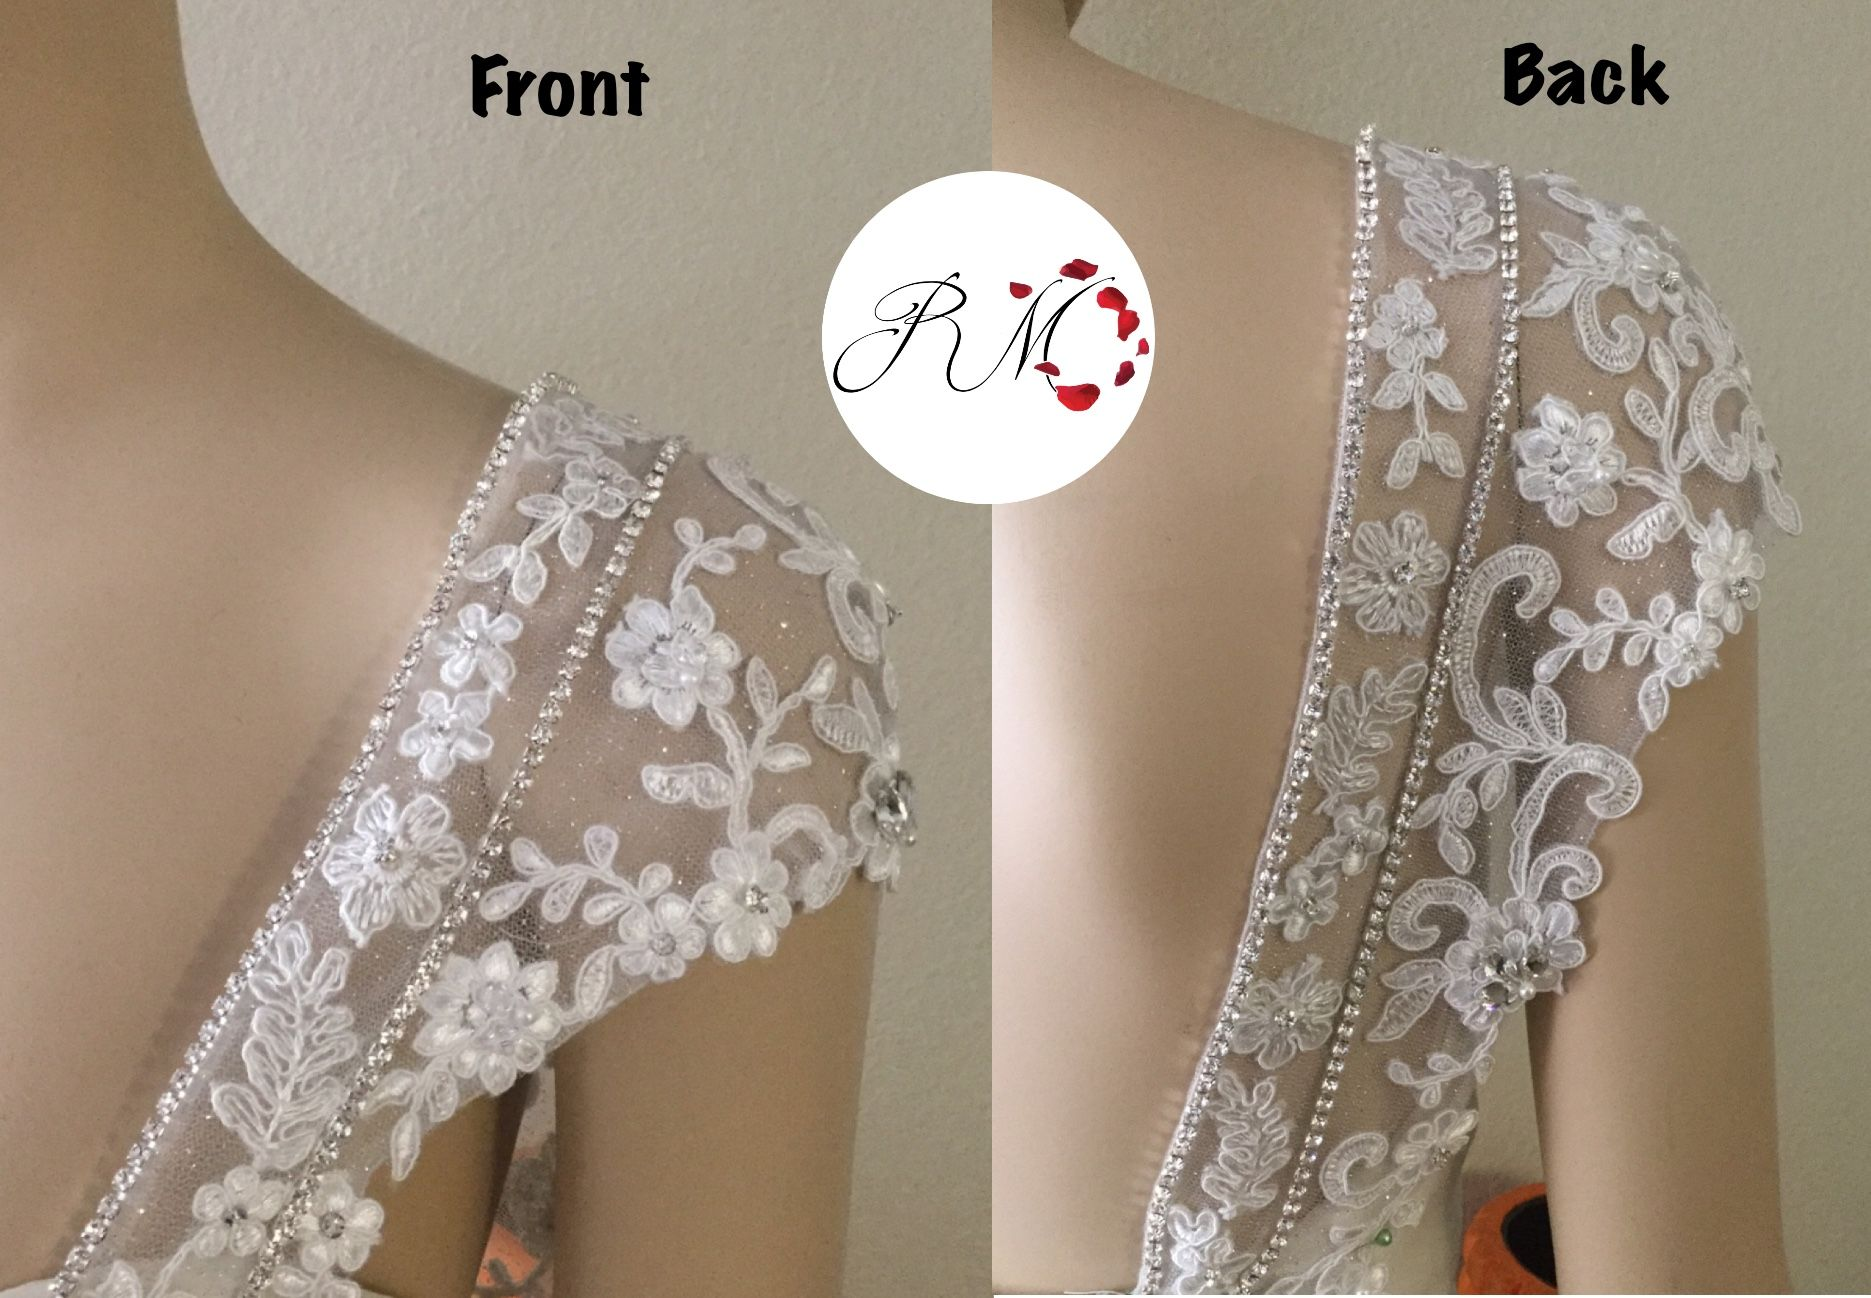 Bridal Straps Cap Sleeves Detachable Wedding Dress Cap Sleeves #112 Custom Sleeves Detachable Straps Detachable Bridal Cap Sleeves